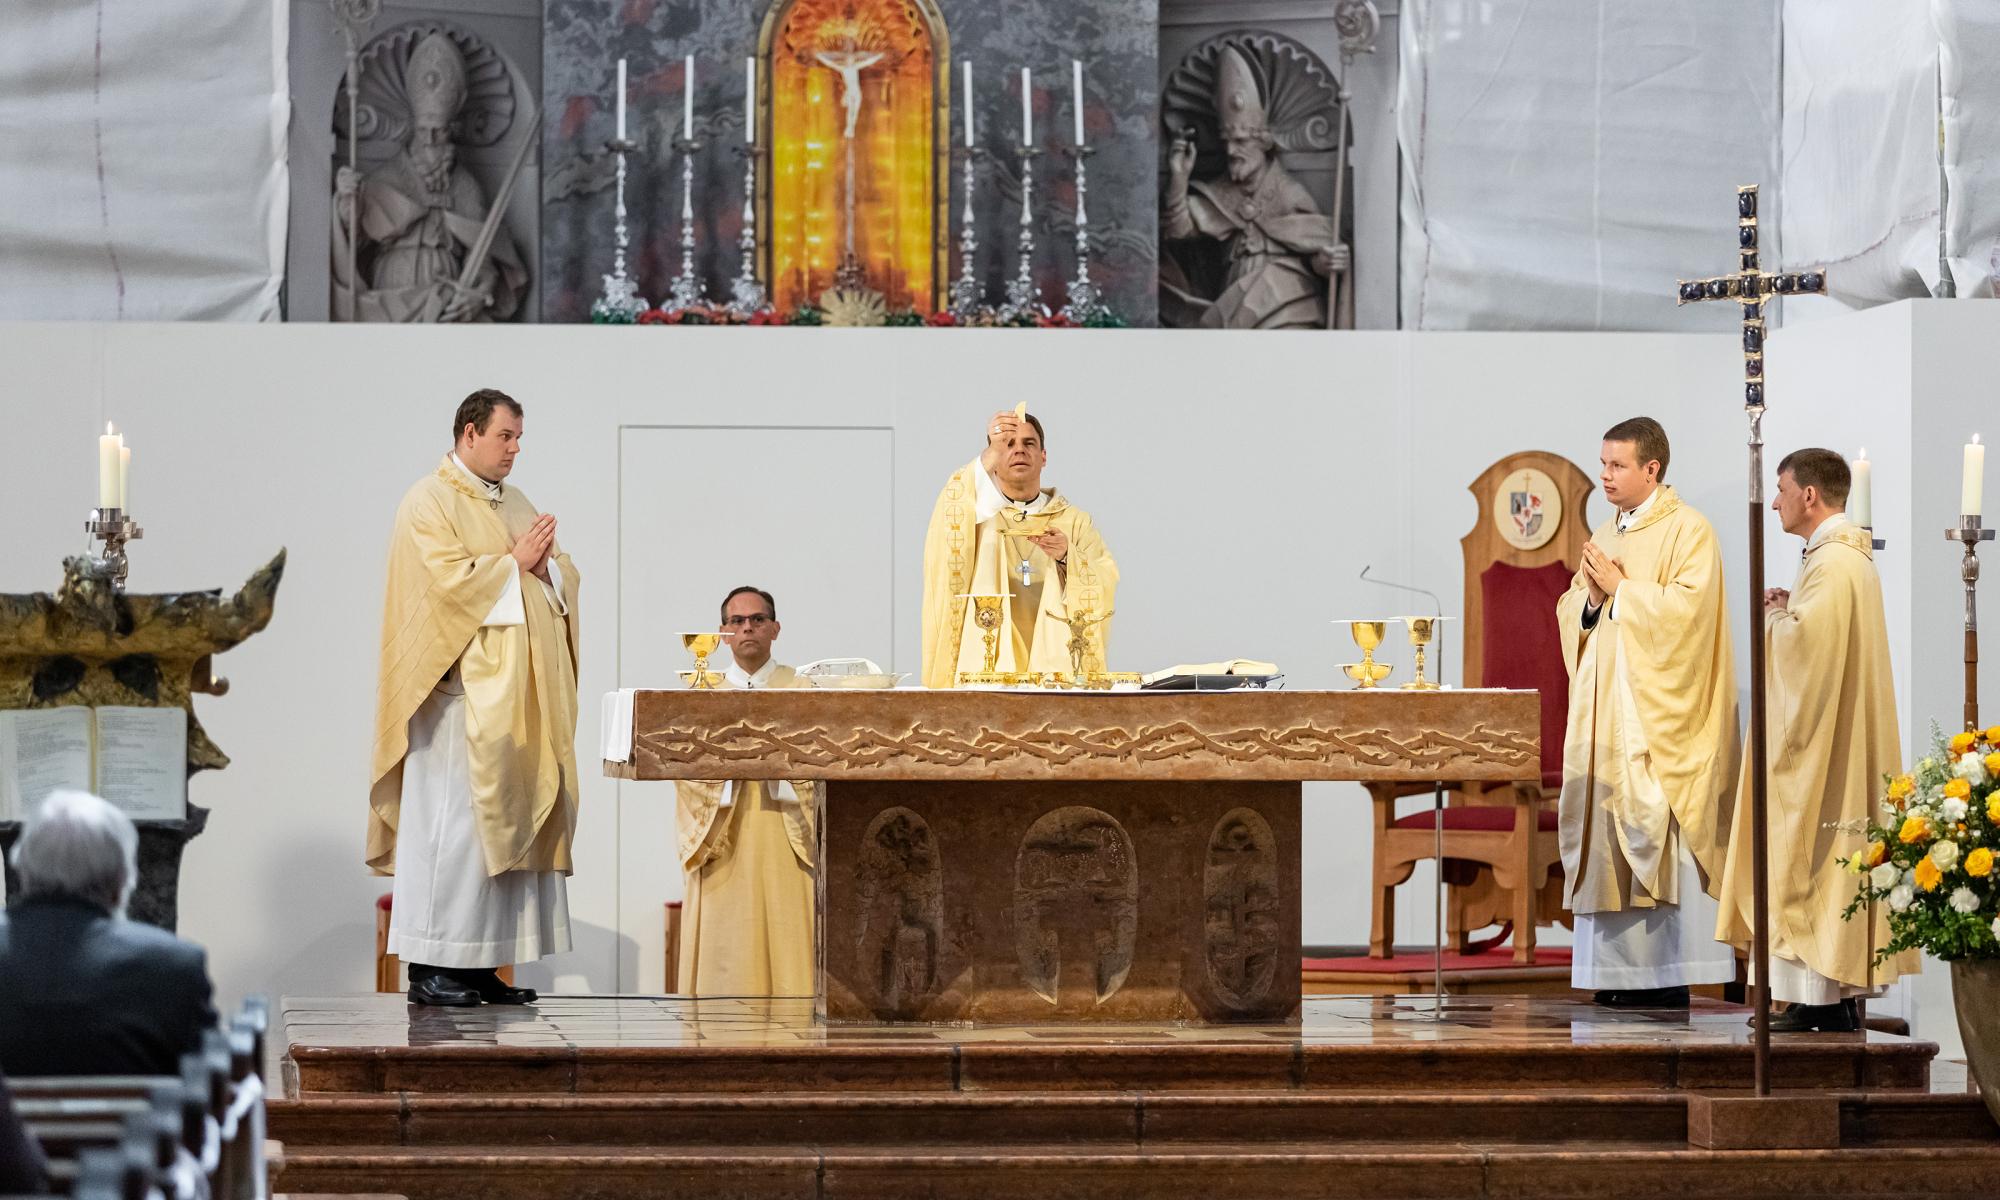 200627 Priesterweihe foto9 Simona Kehl